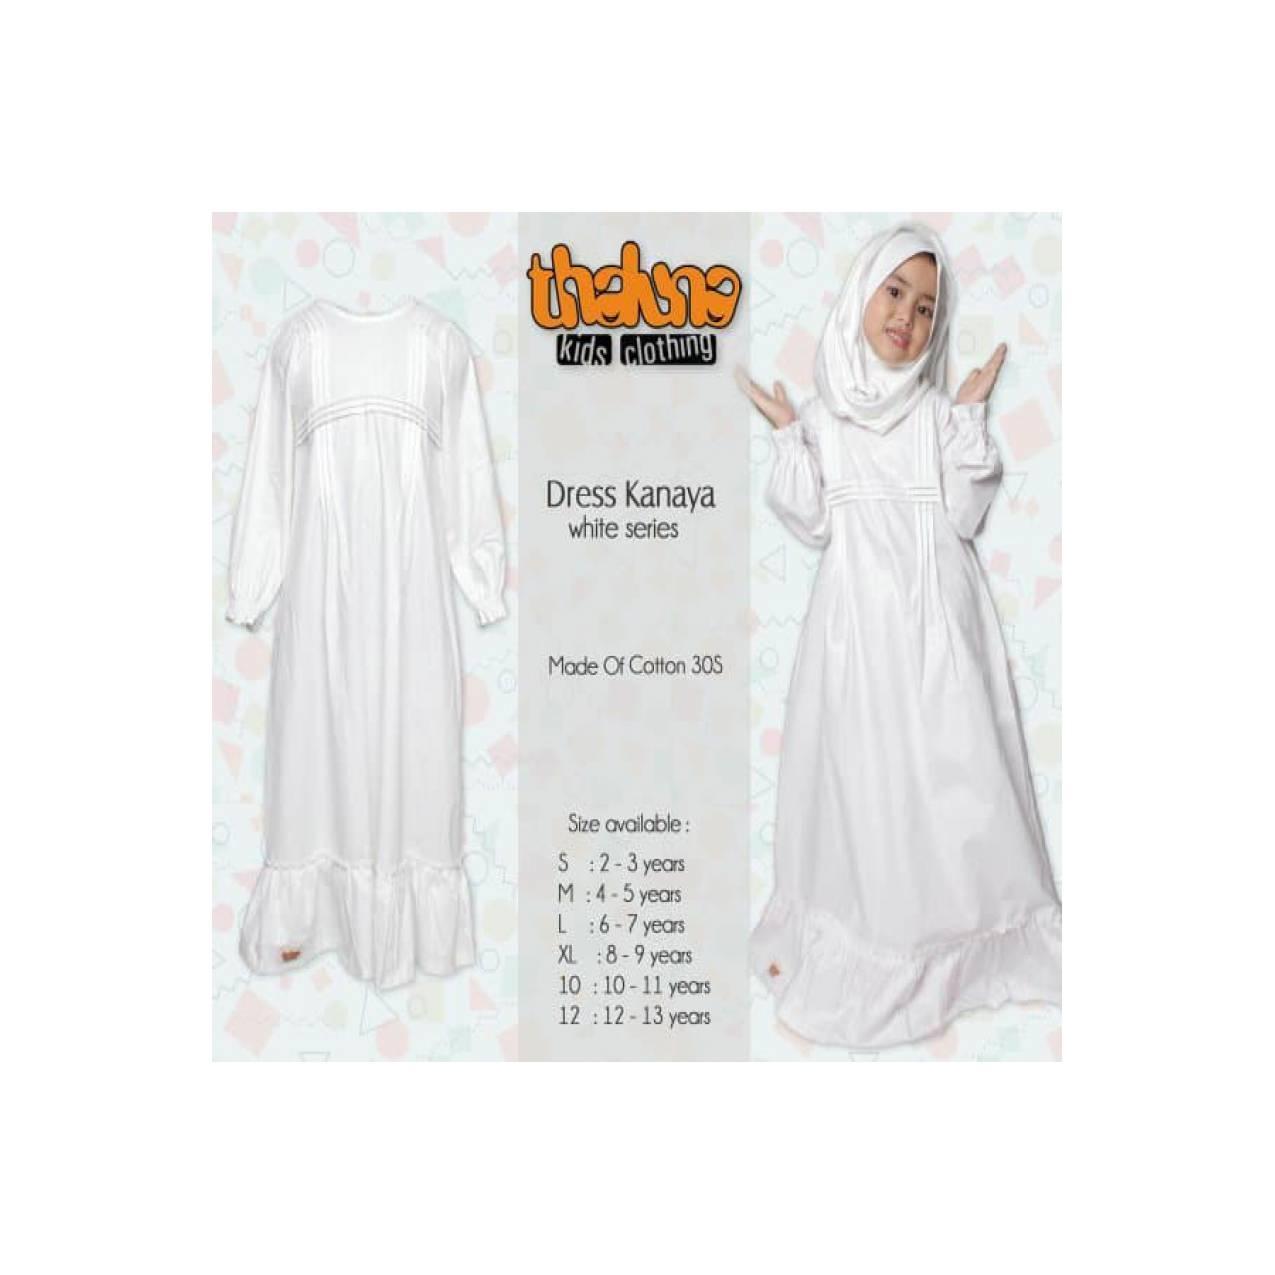 EKLUSIF Set Busana Muslim Anak Balita TK SD warna Putih, Dress Kanaya